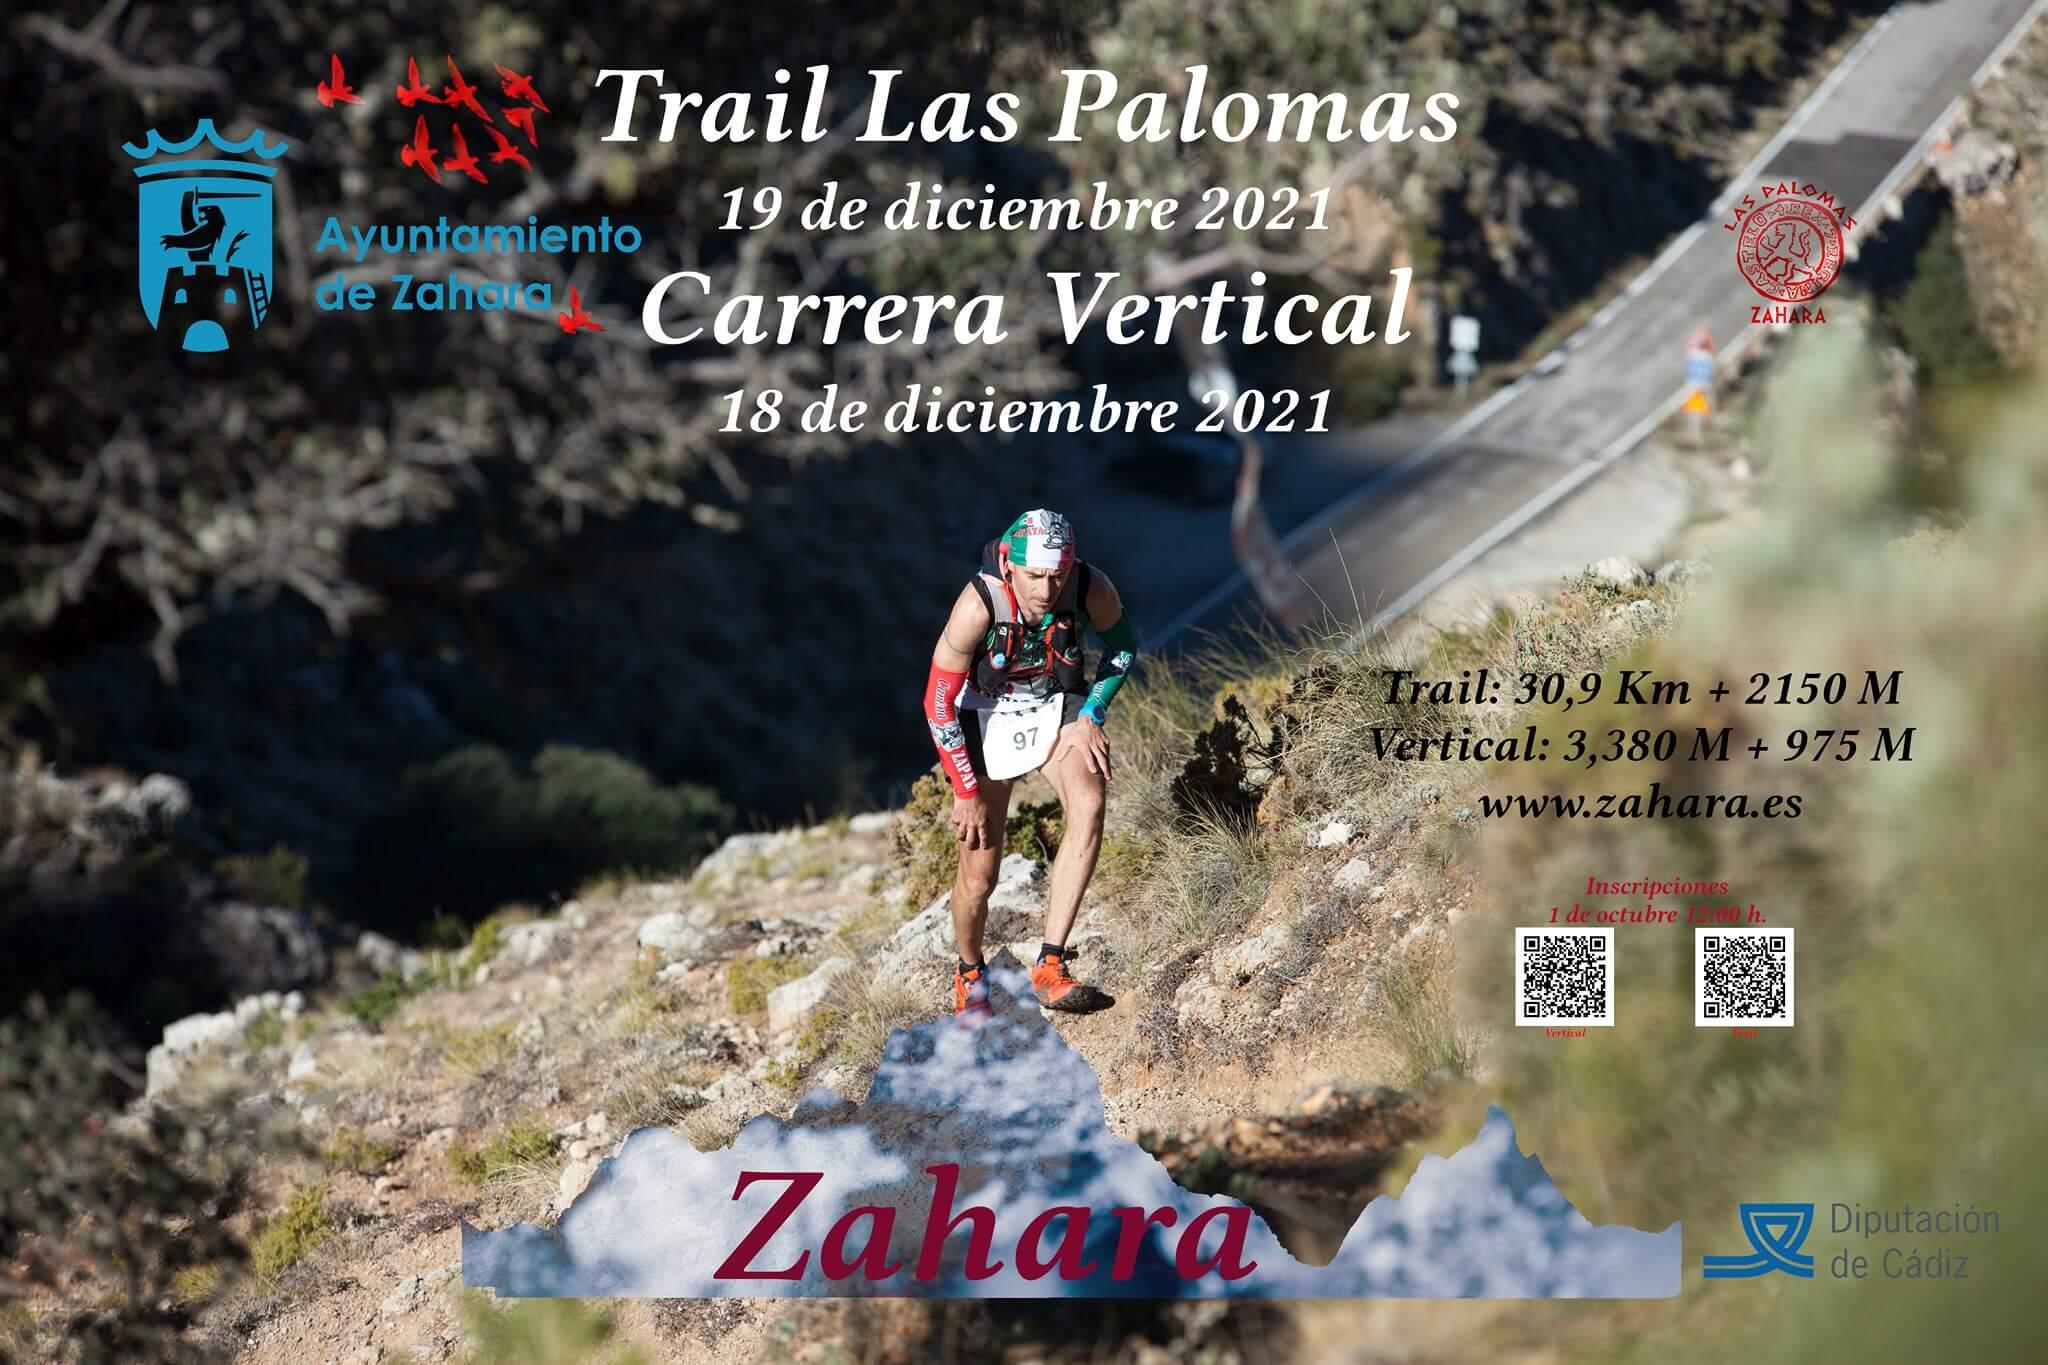 Trail Las Palomas